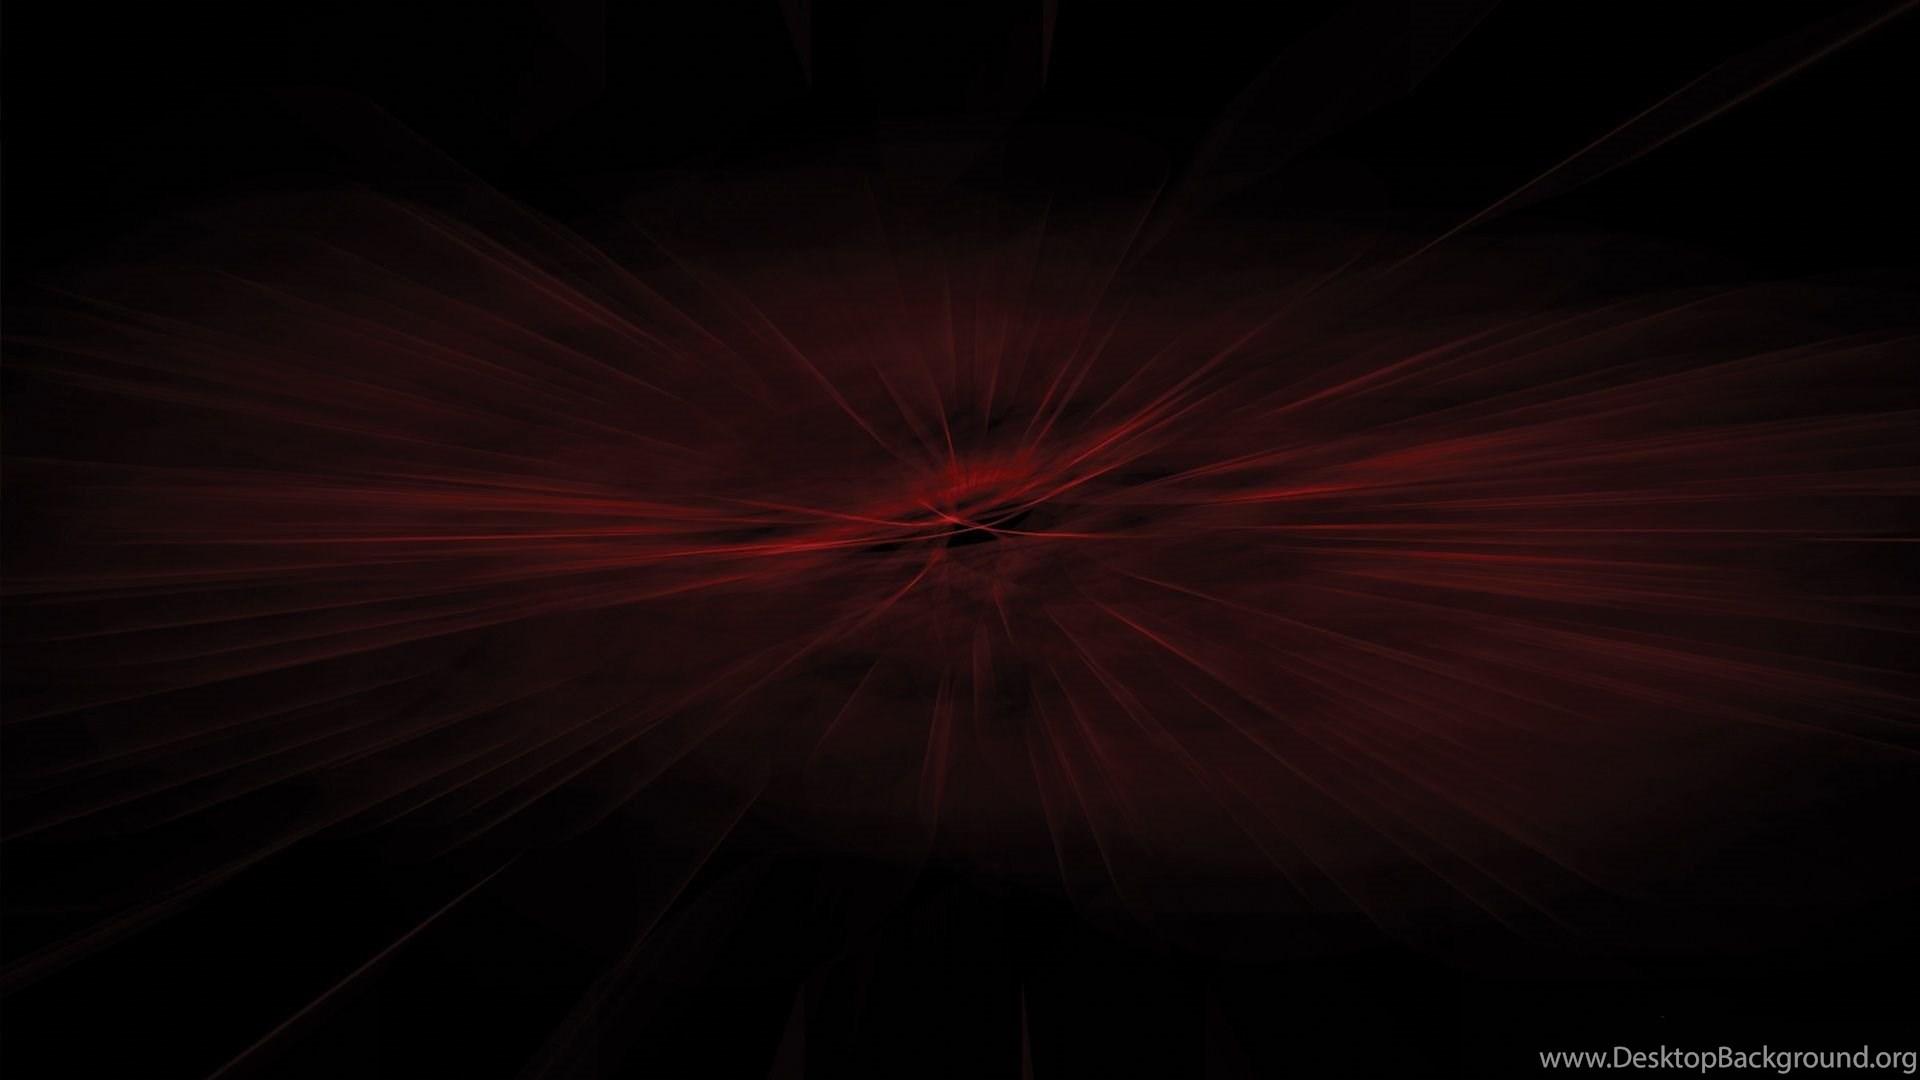 Abstract Red Wallpaper Dark Background For Desktop Image Jpg